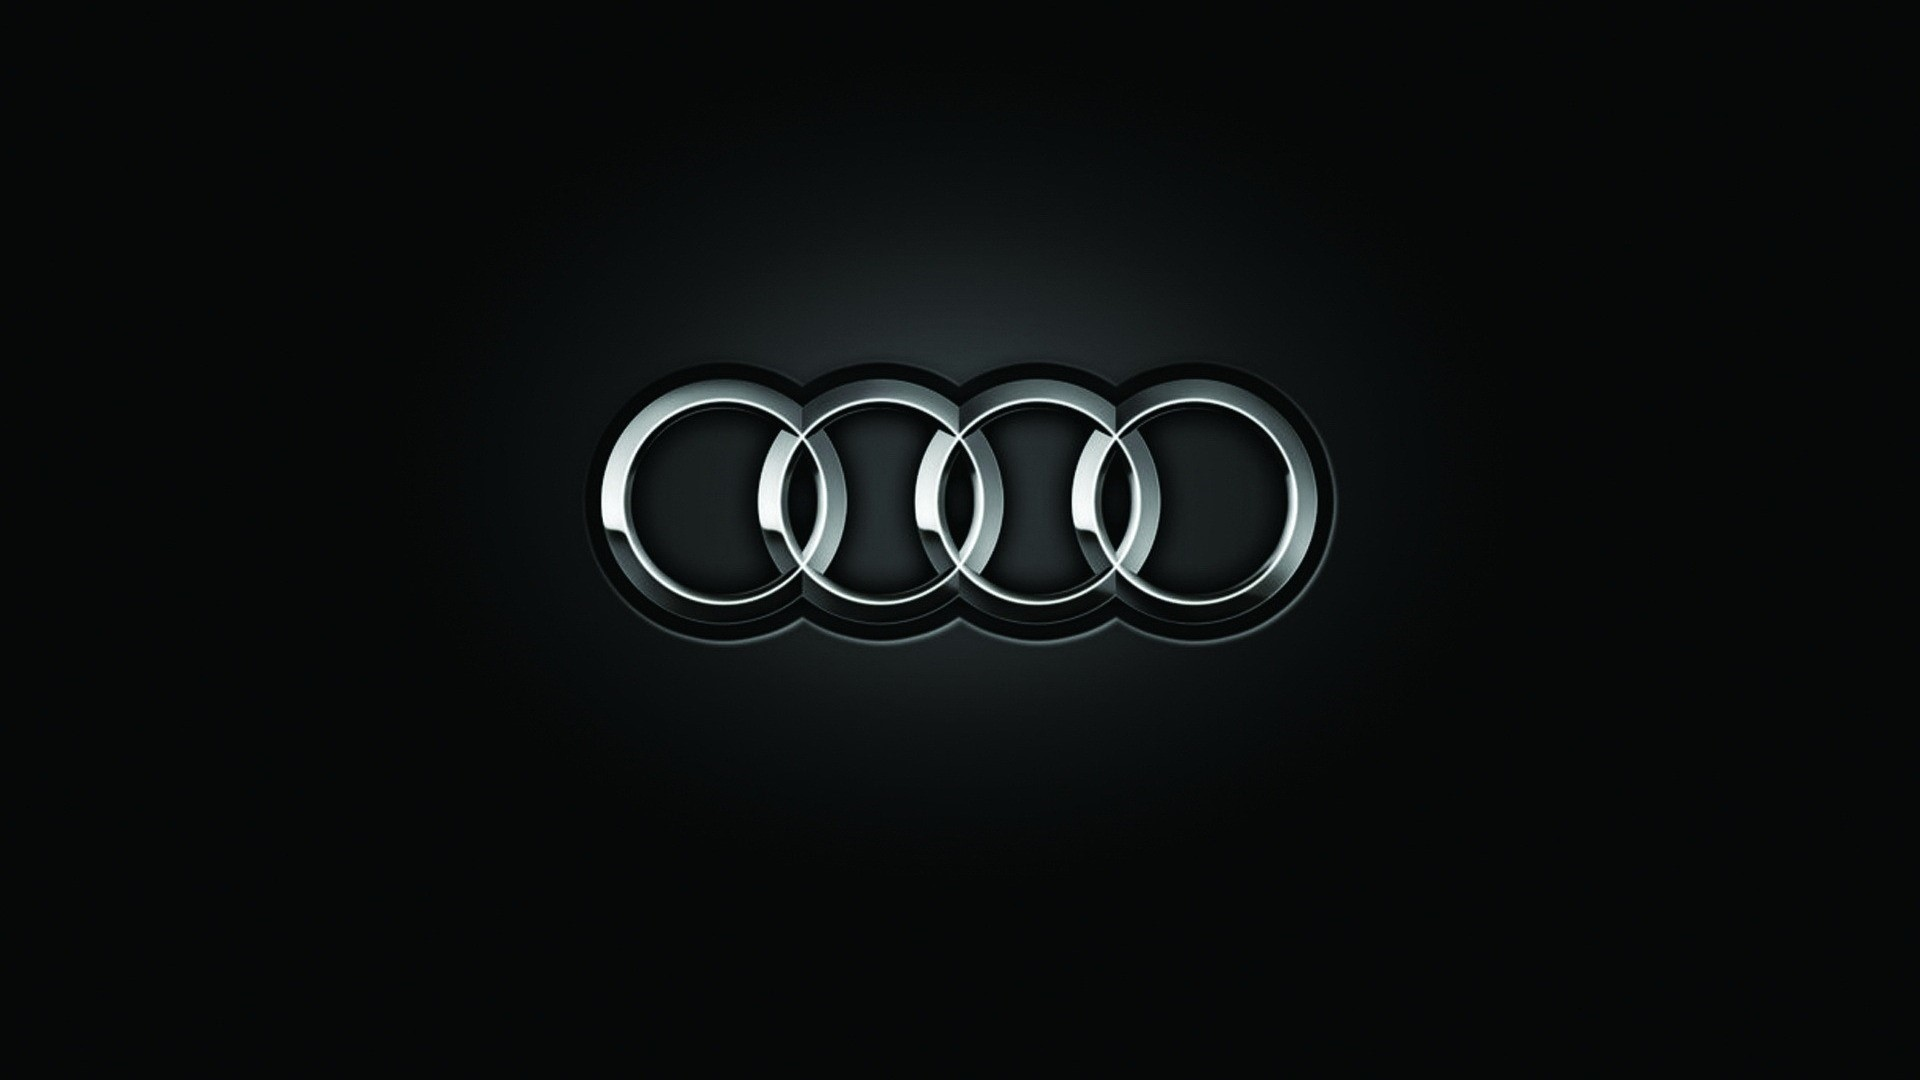 Audi Luxury Car Company Logo HD Photo HD Famous Wallpapers 1920x1080